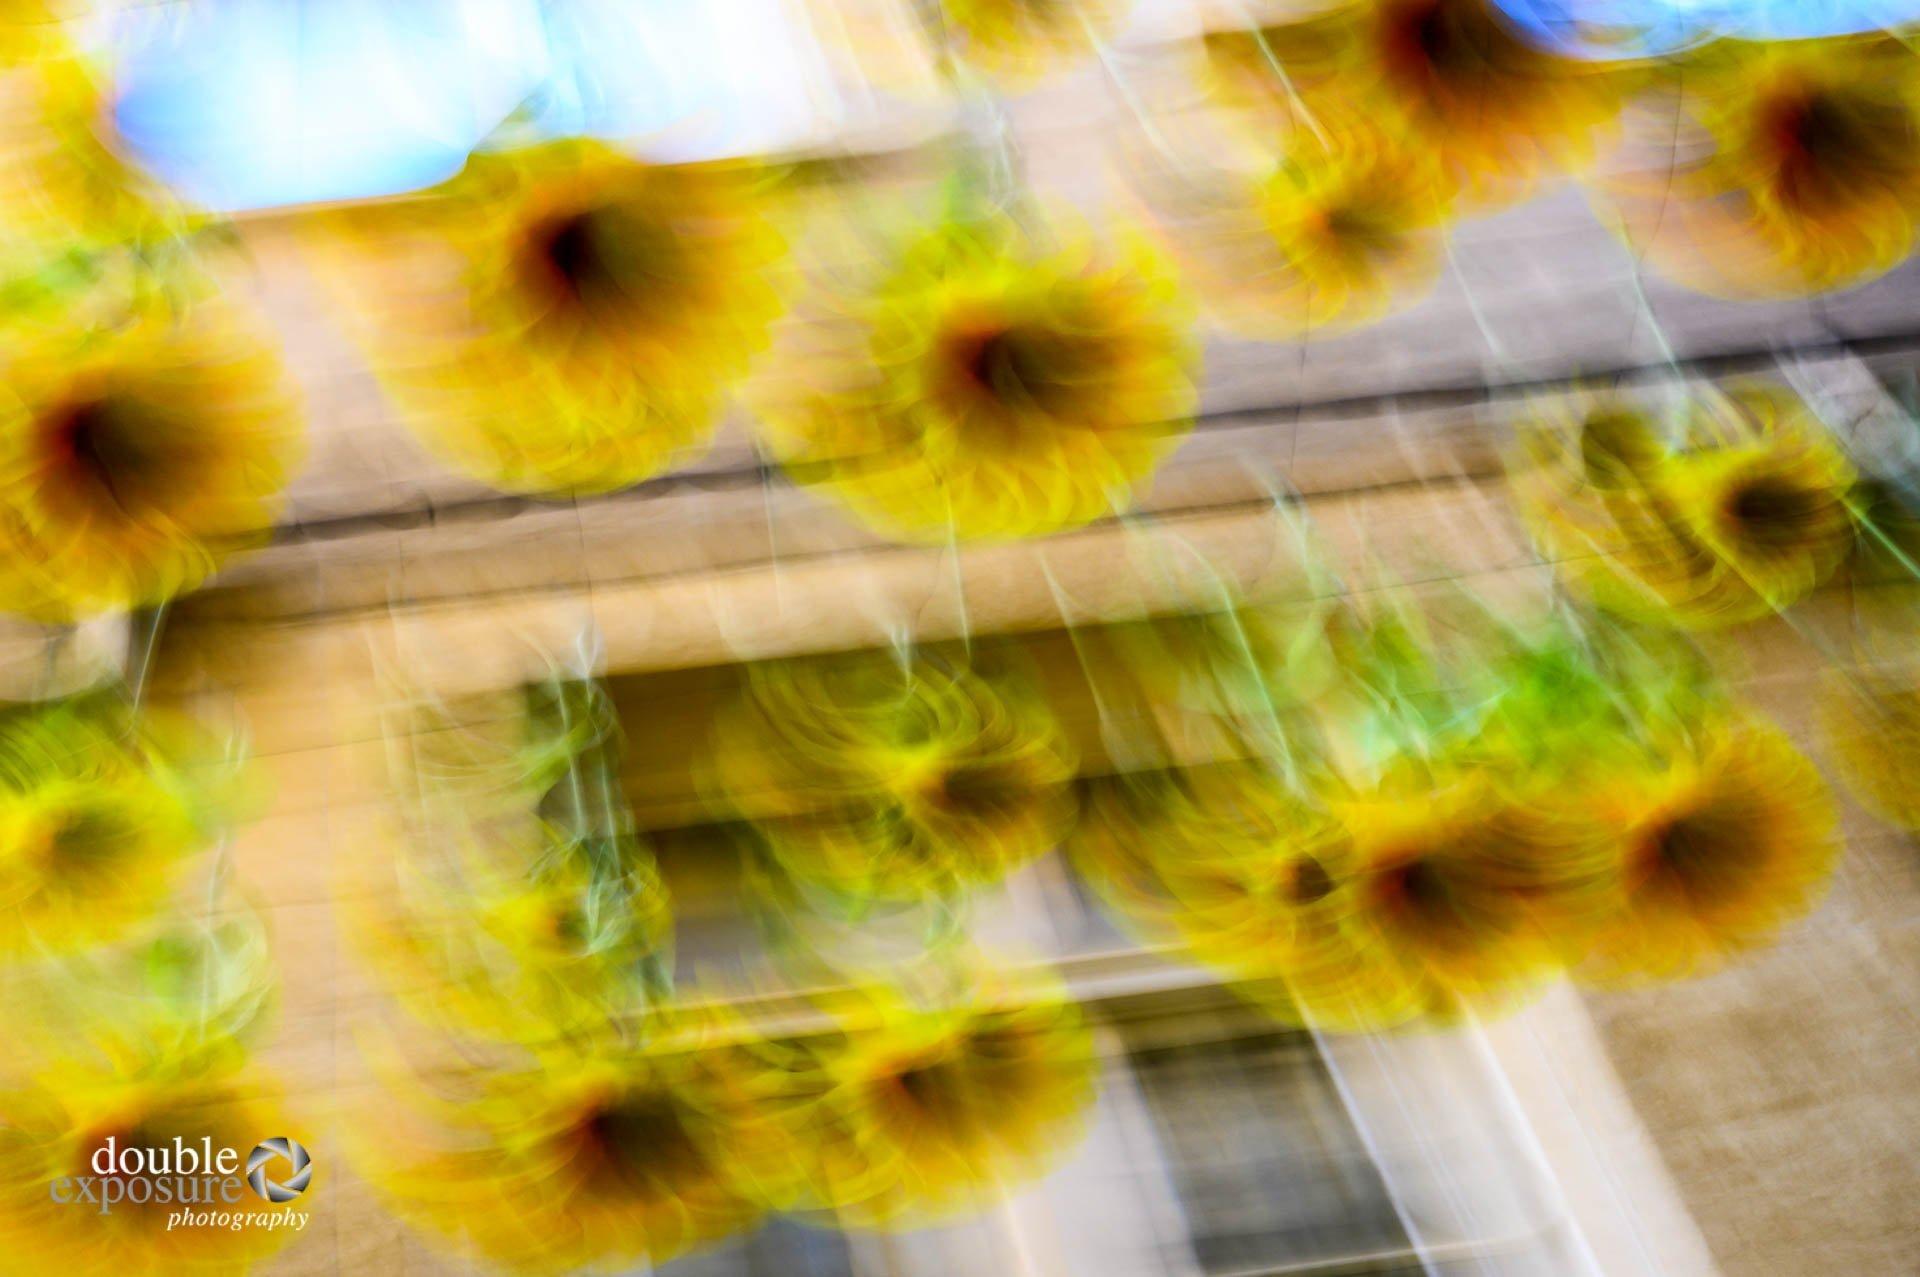 sunflowers on a city street